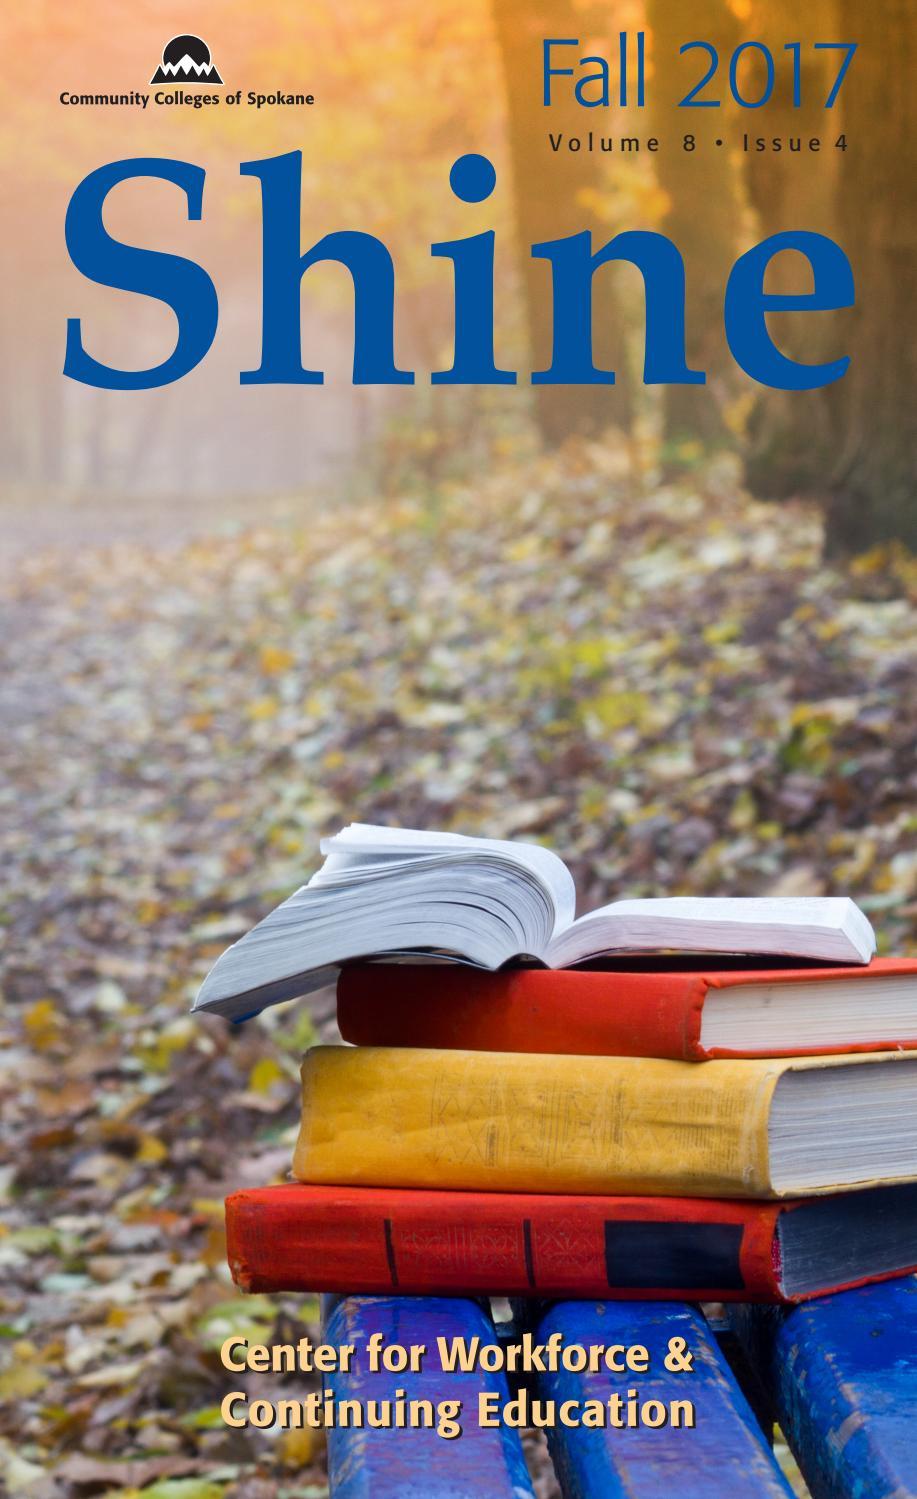 Spokane Community Colleges Academic Calendar | Printable For White Plains School District Calendar 2021